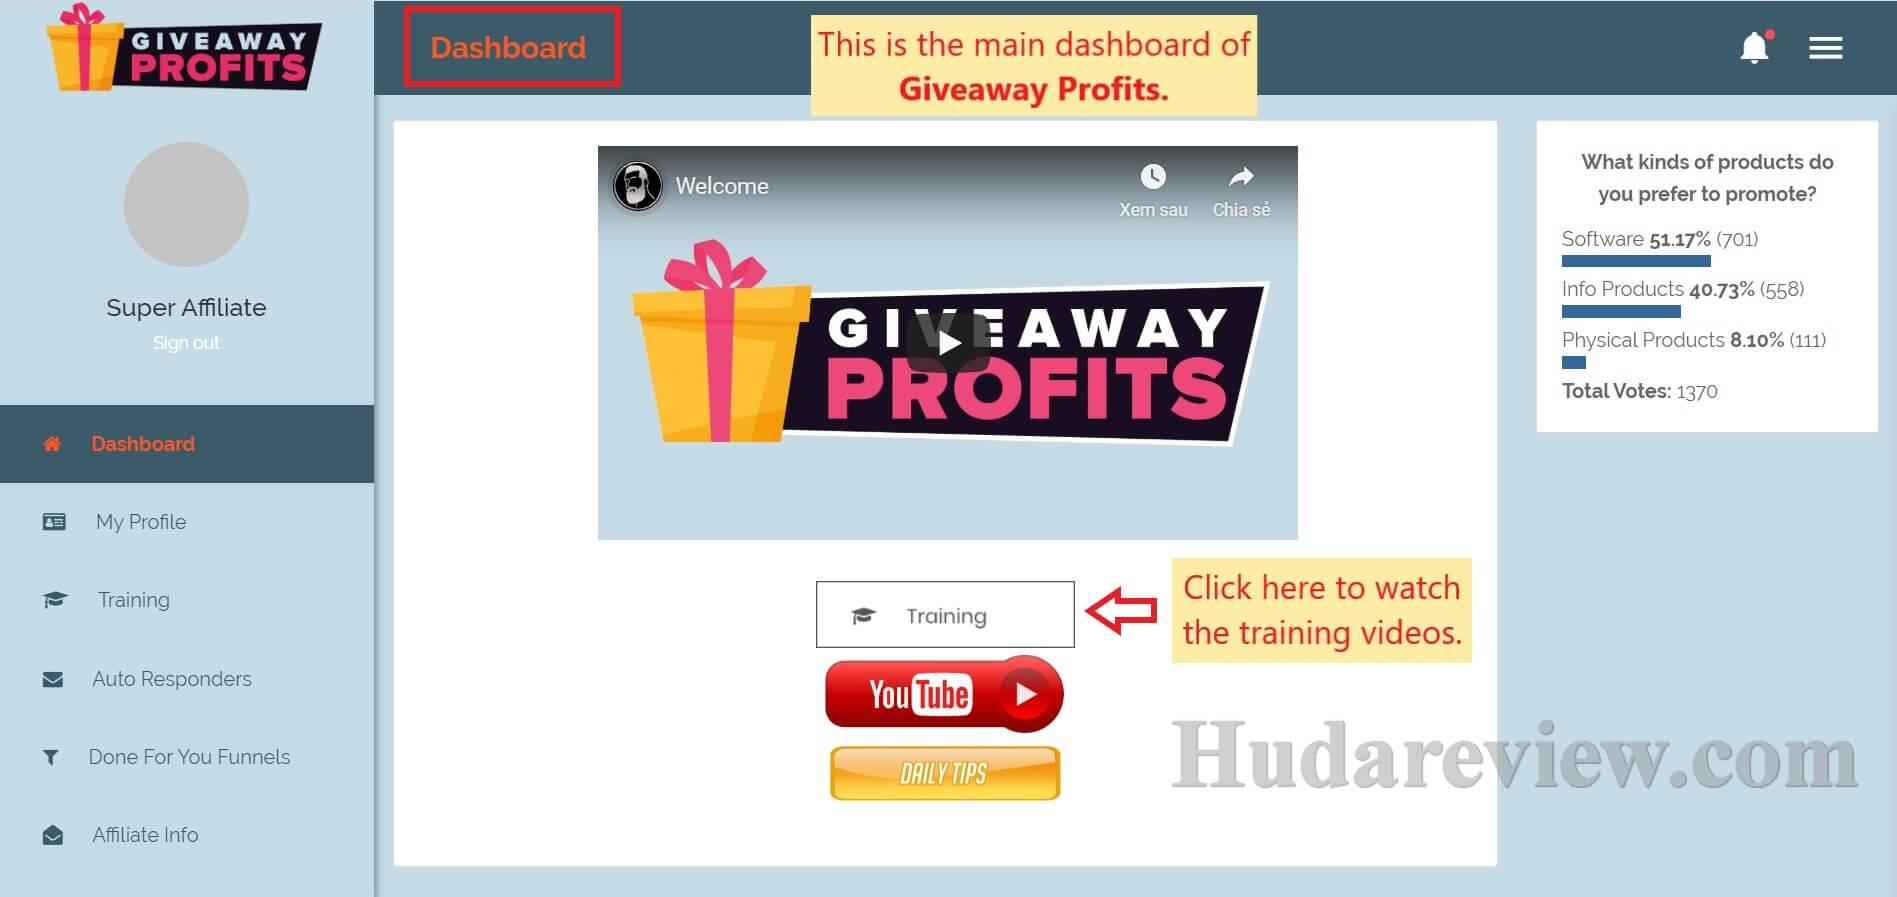 Giveaway-Profits-Review-1-2